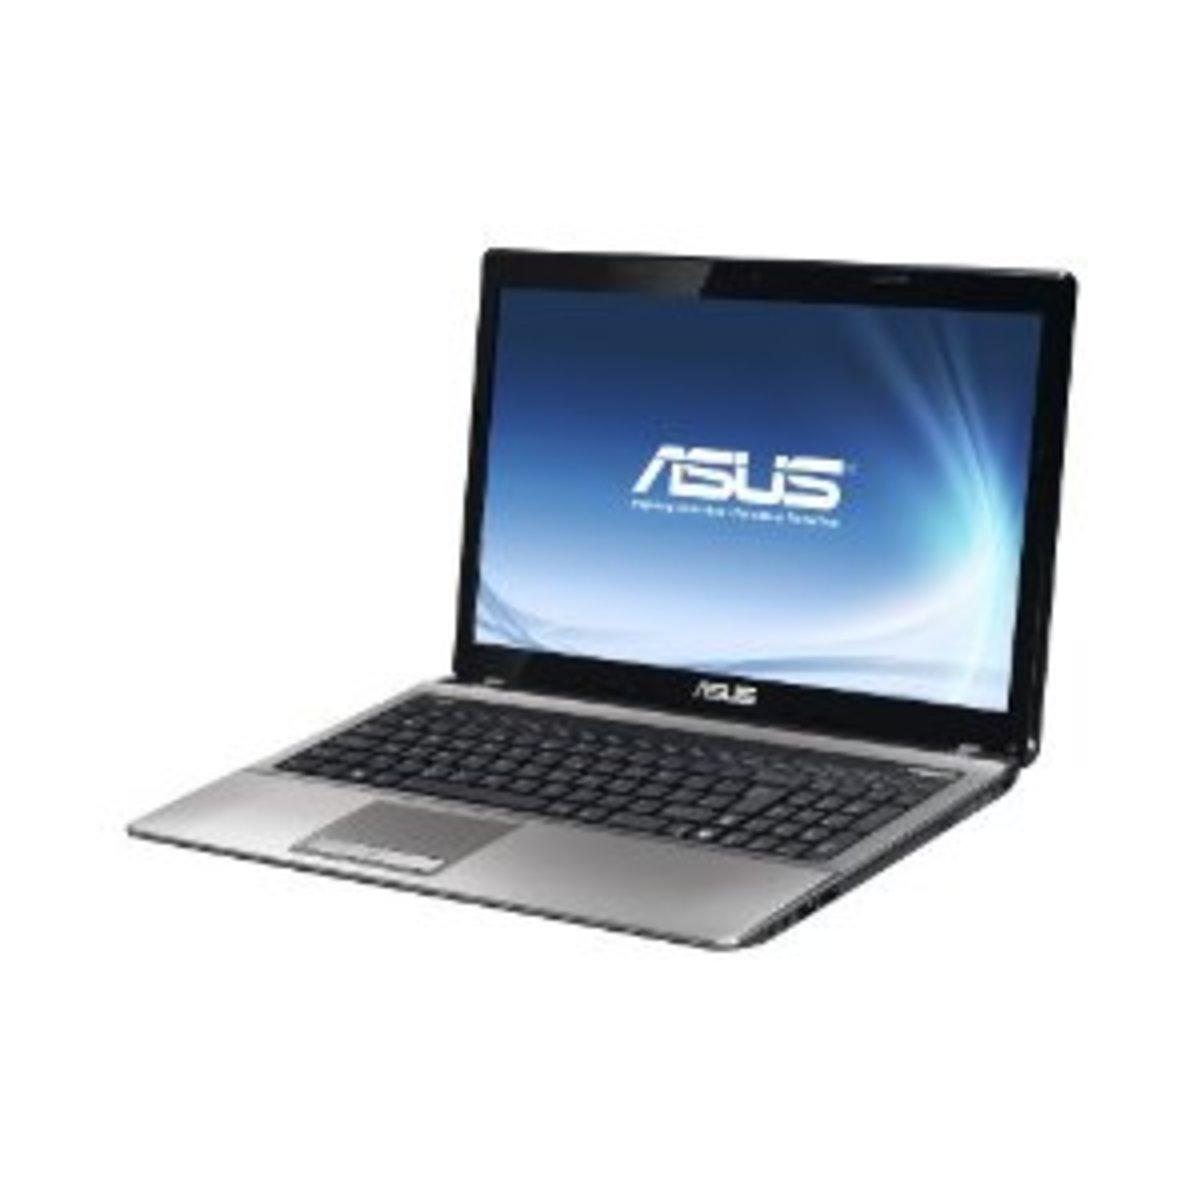 asus-a53s-laptop-review